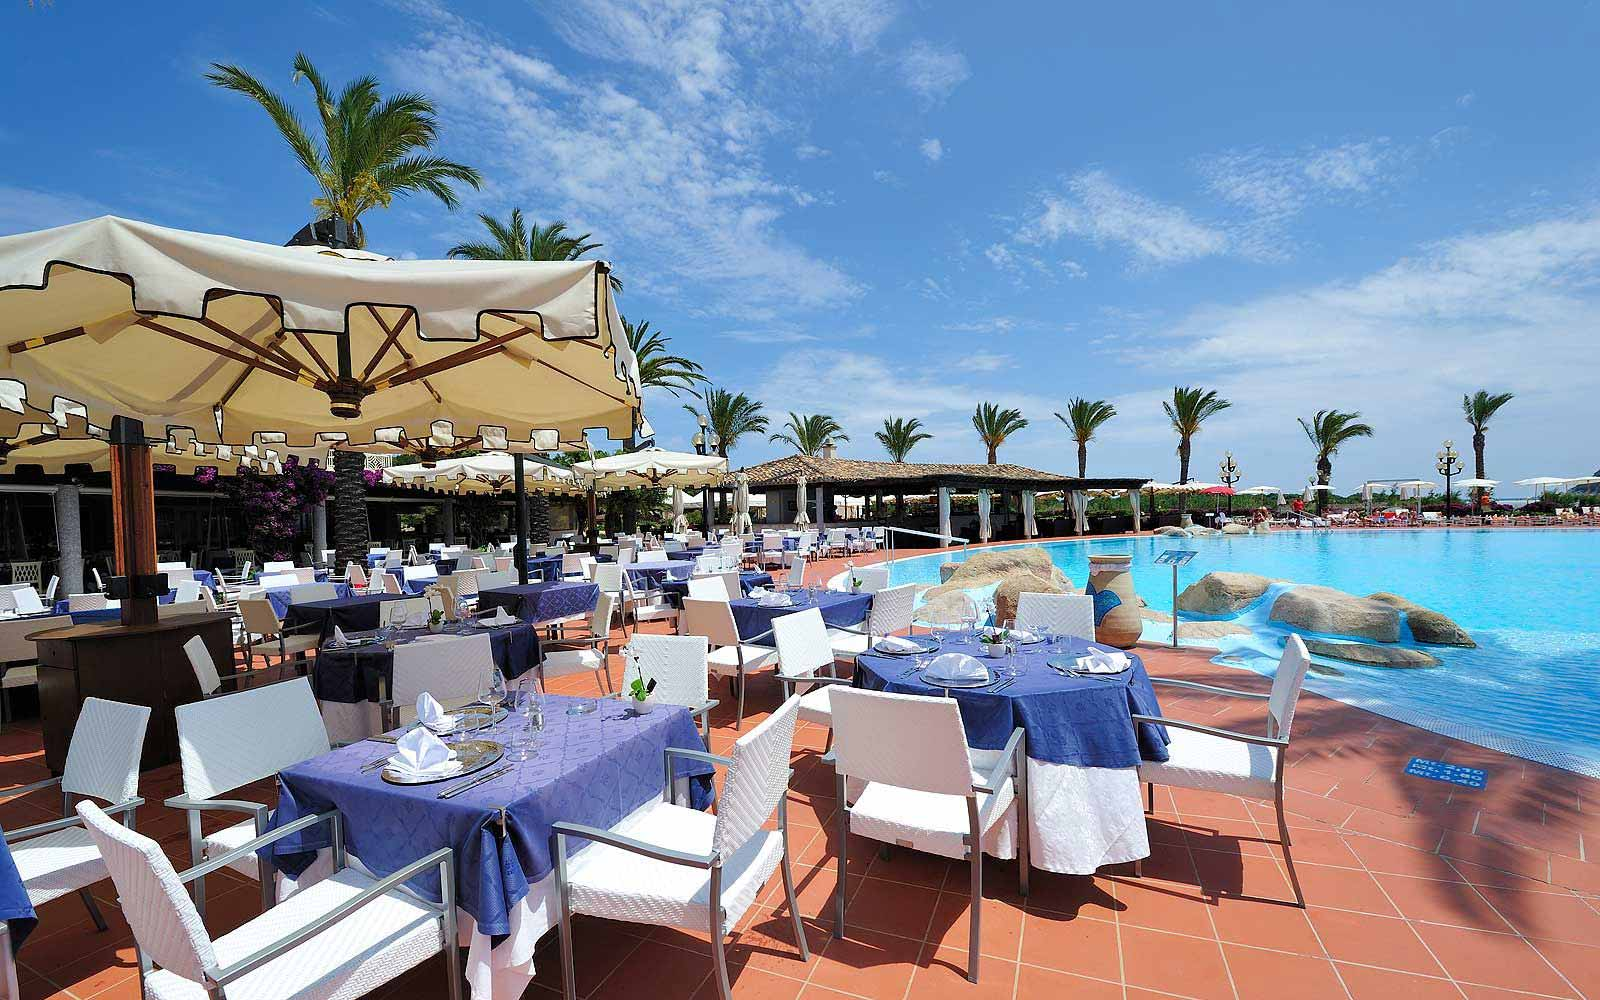 La Veranda restaurant at Pullman Timi Ama Sardegna